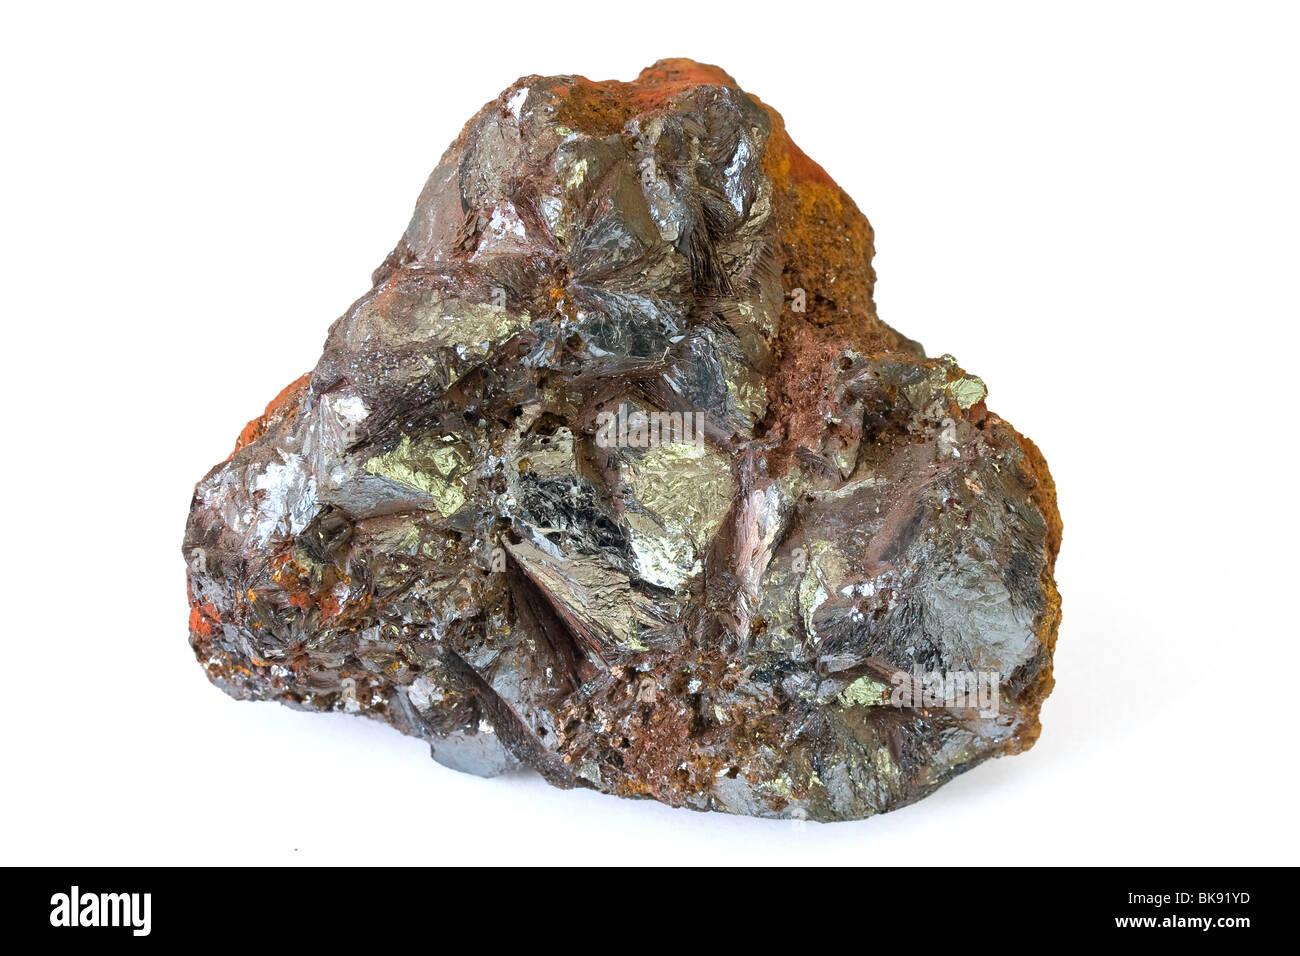 hematite mineral from Elba isle isolated on white background - Stock Image